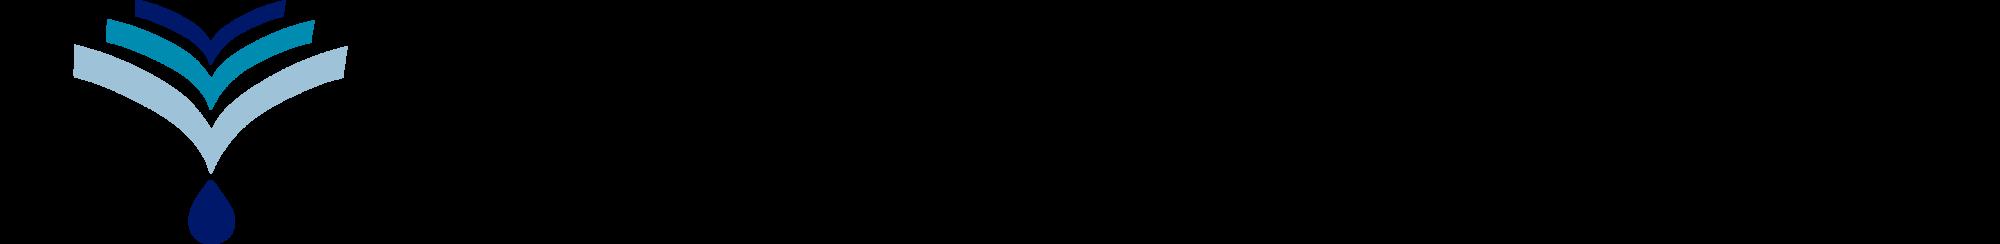 Vacuflex